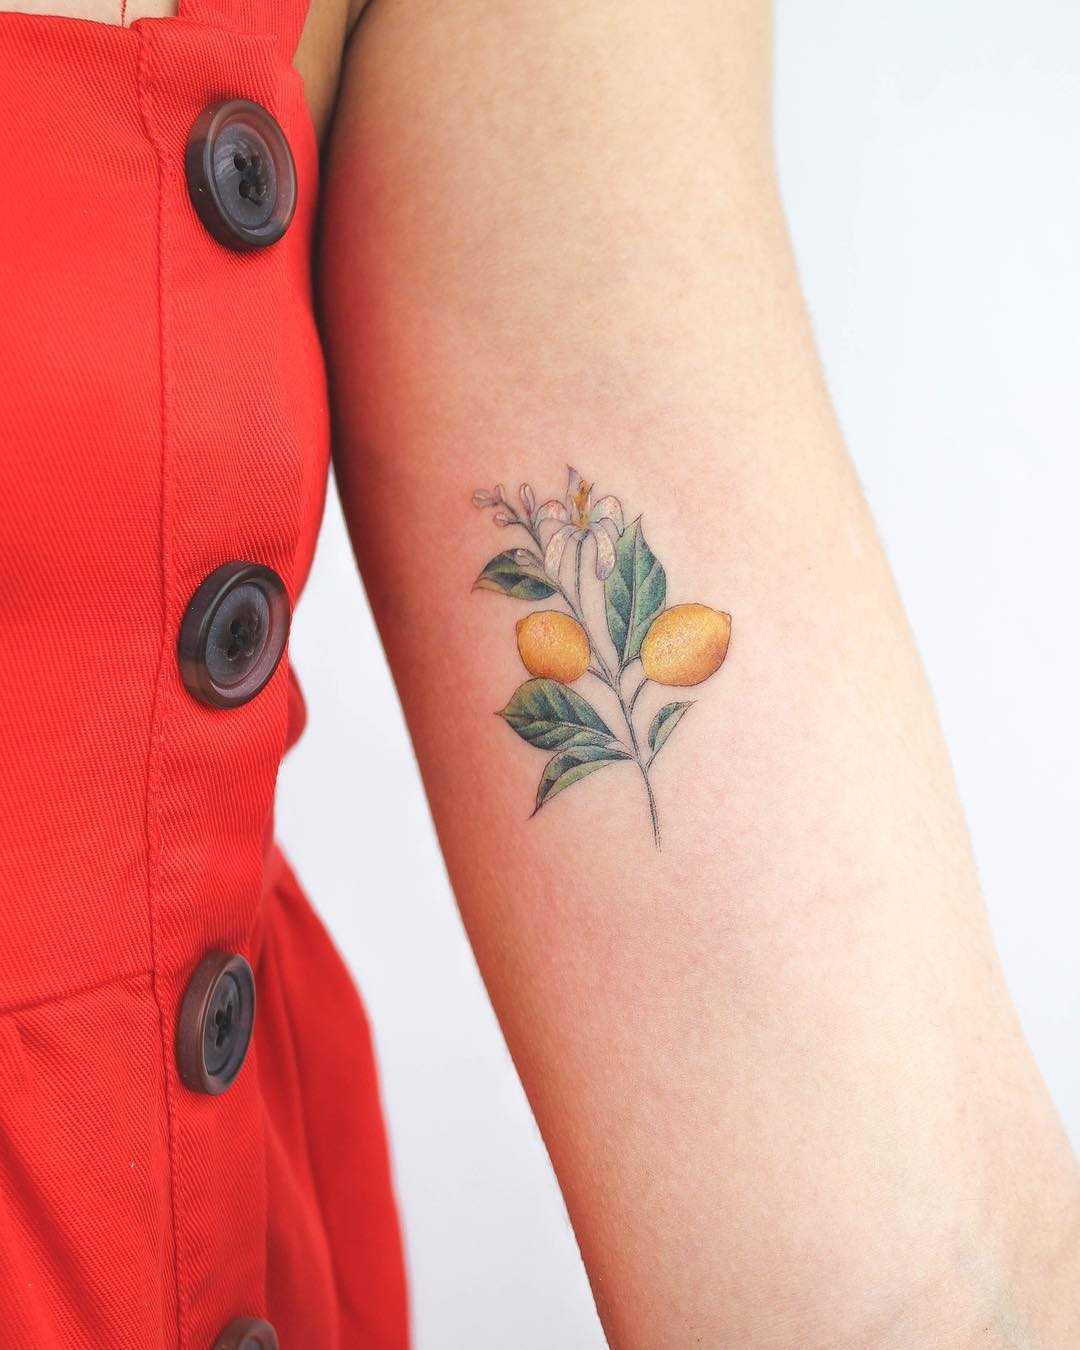 Lemon branch tattoo